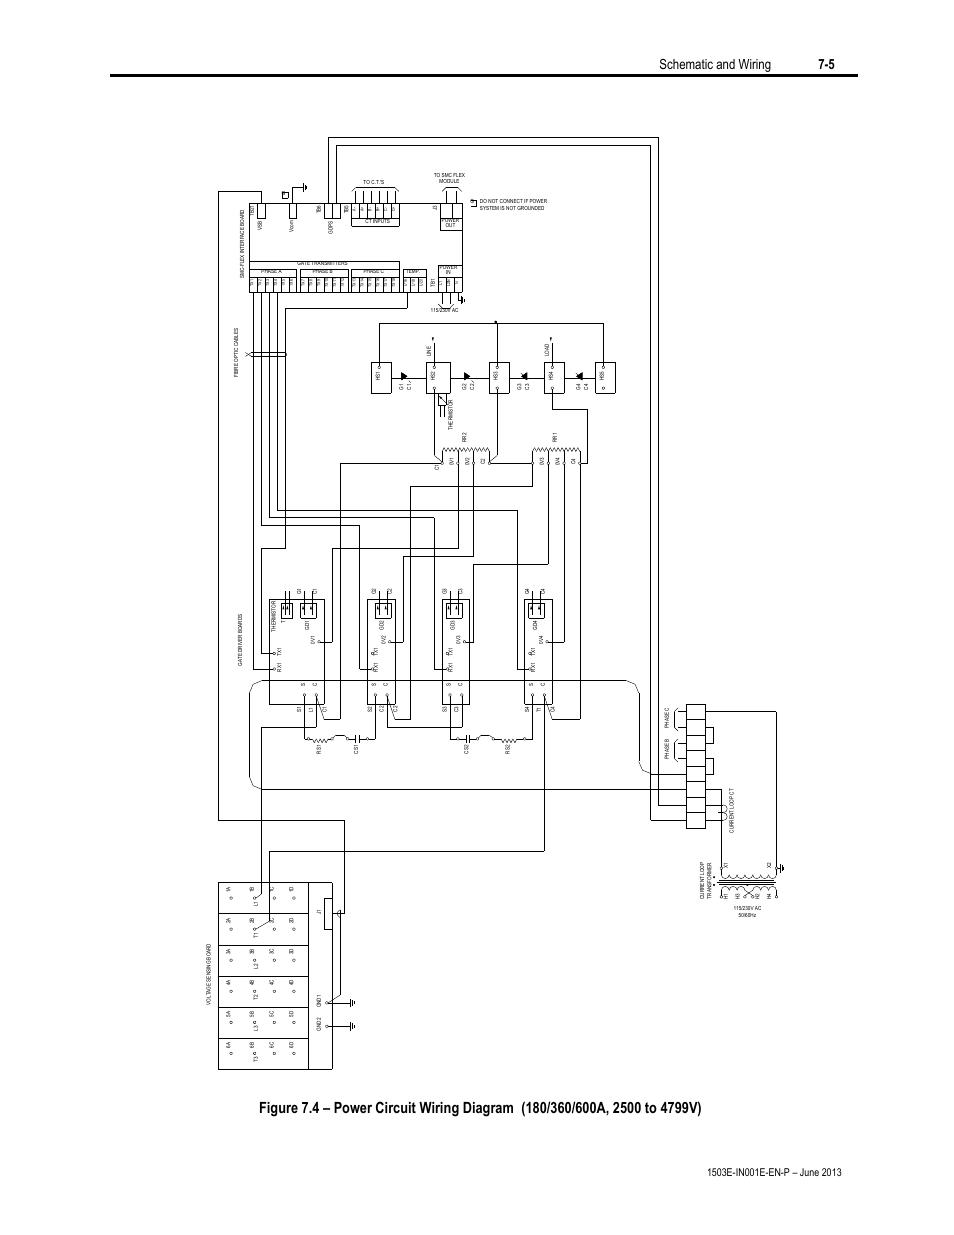 after oct 14 2001 peterbilt 387 complete wiring diagram